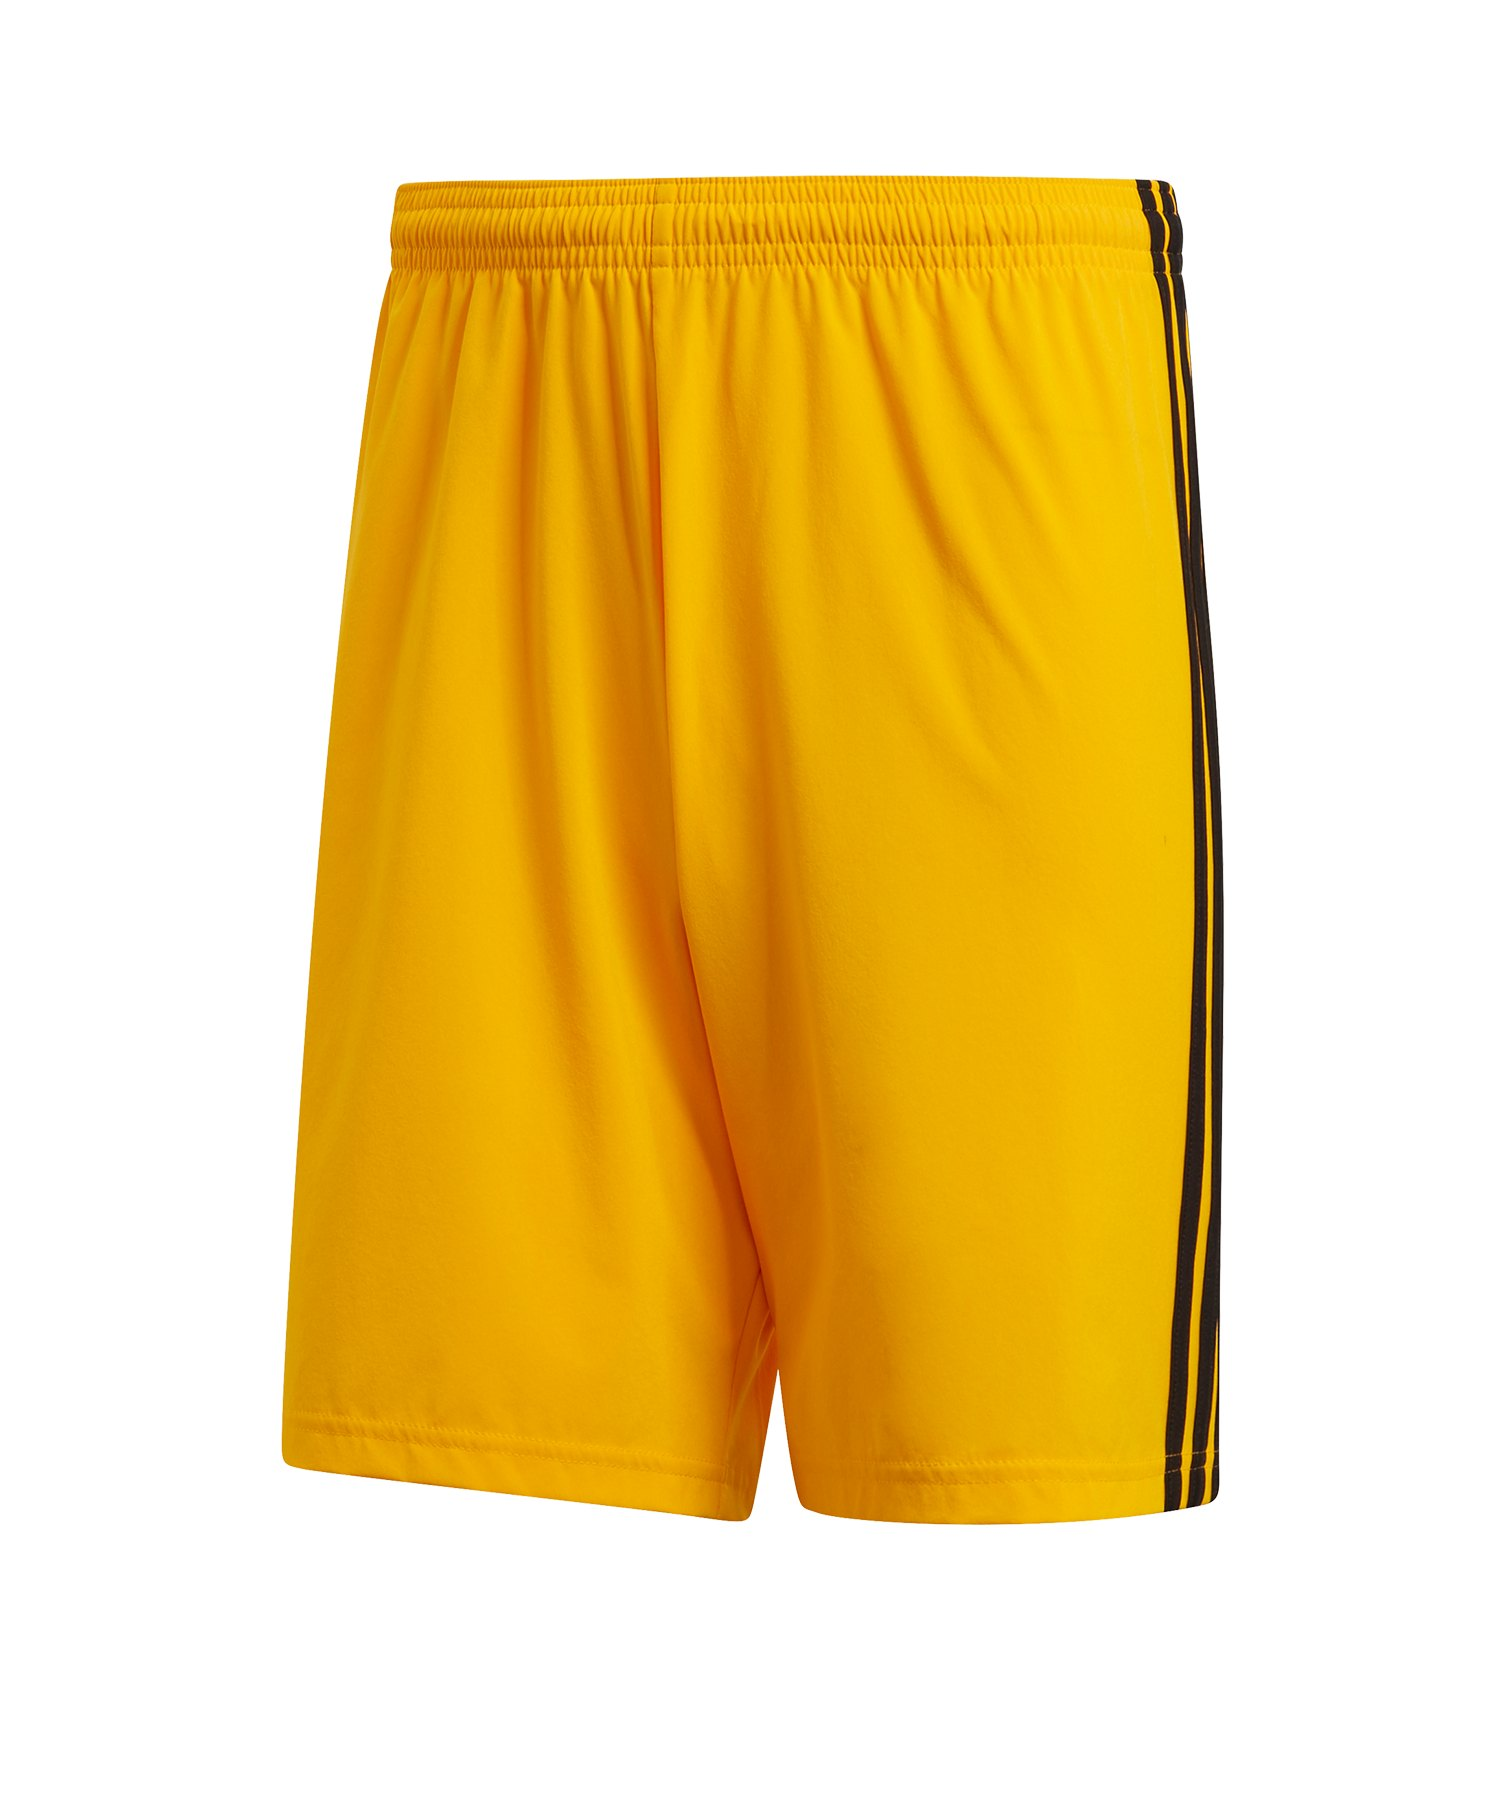 adidas Condivo 18 Short Hose kurz Gold Schwarz - gold